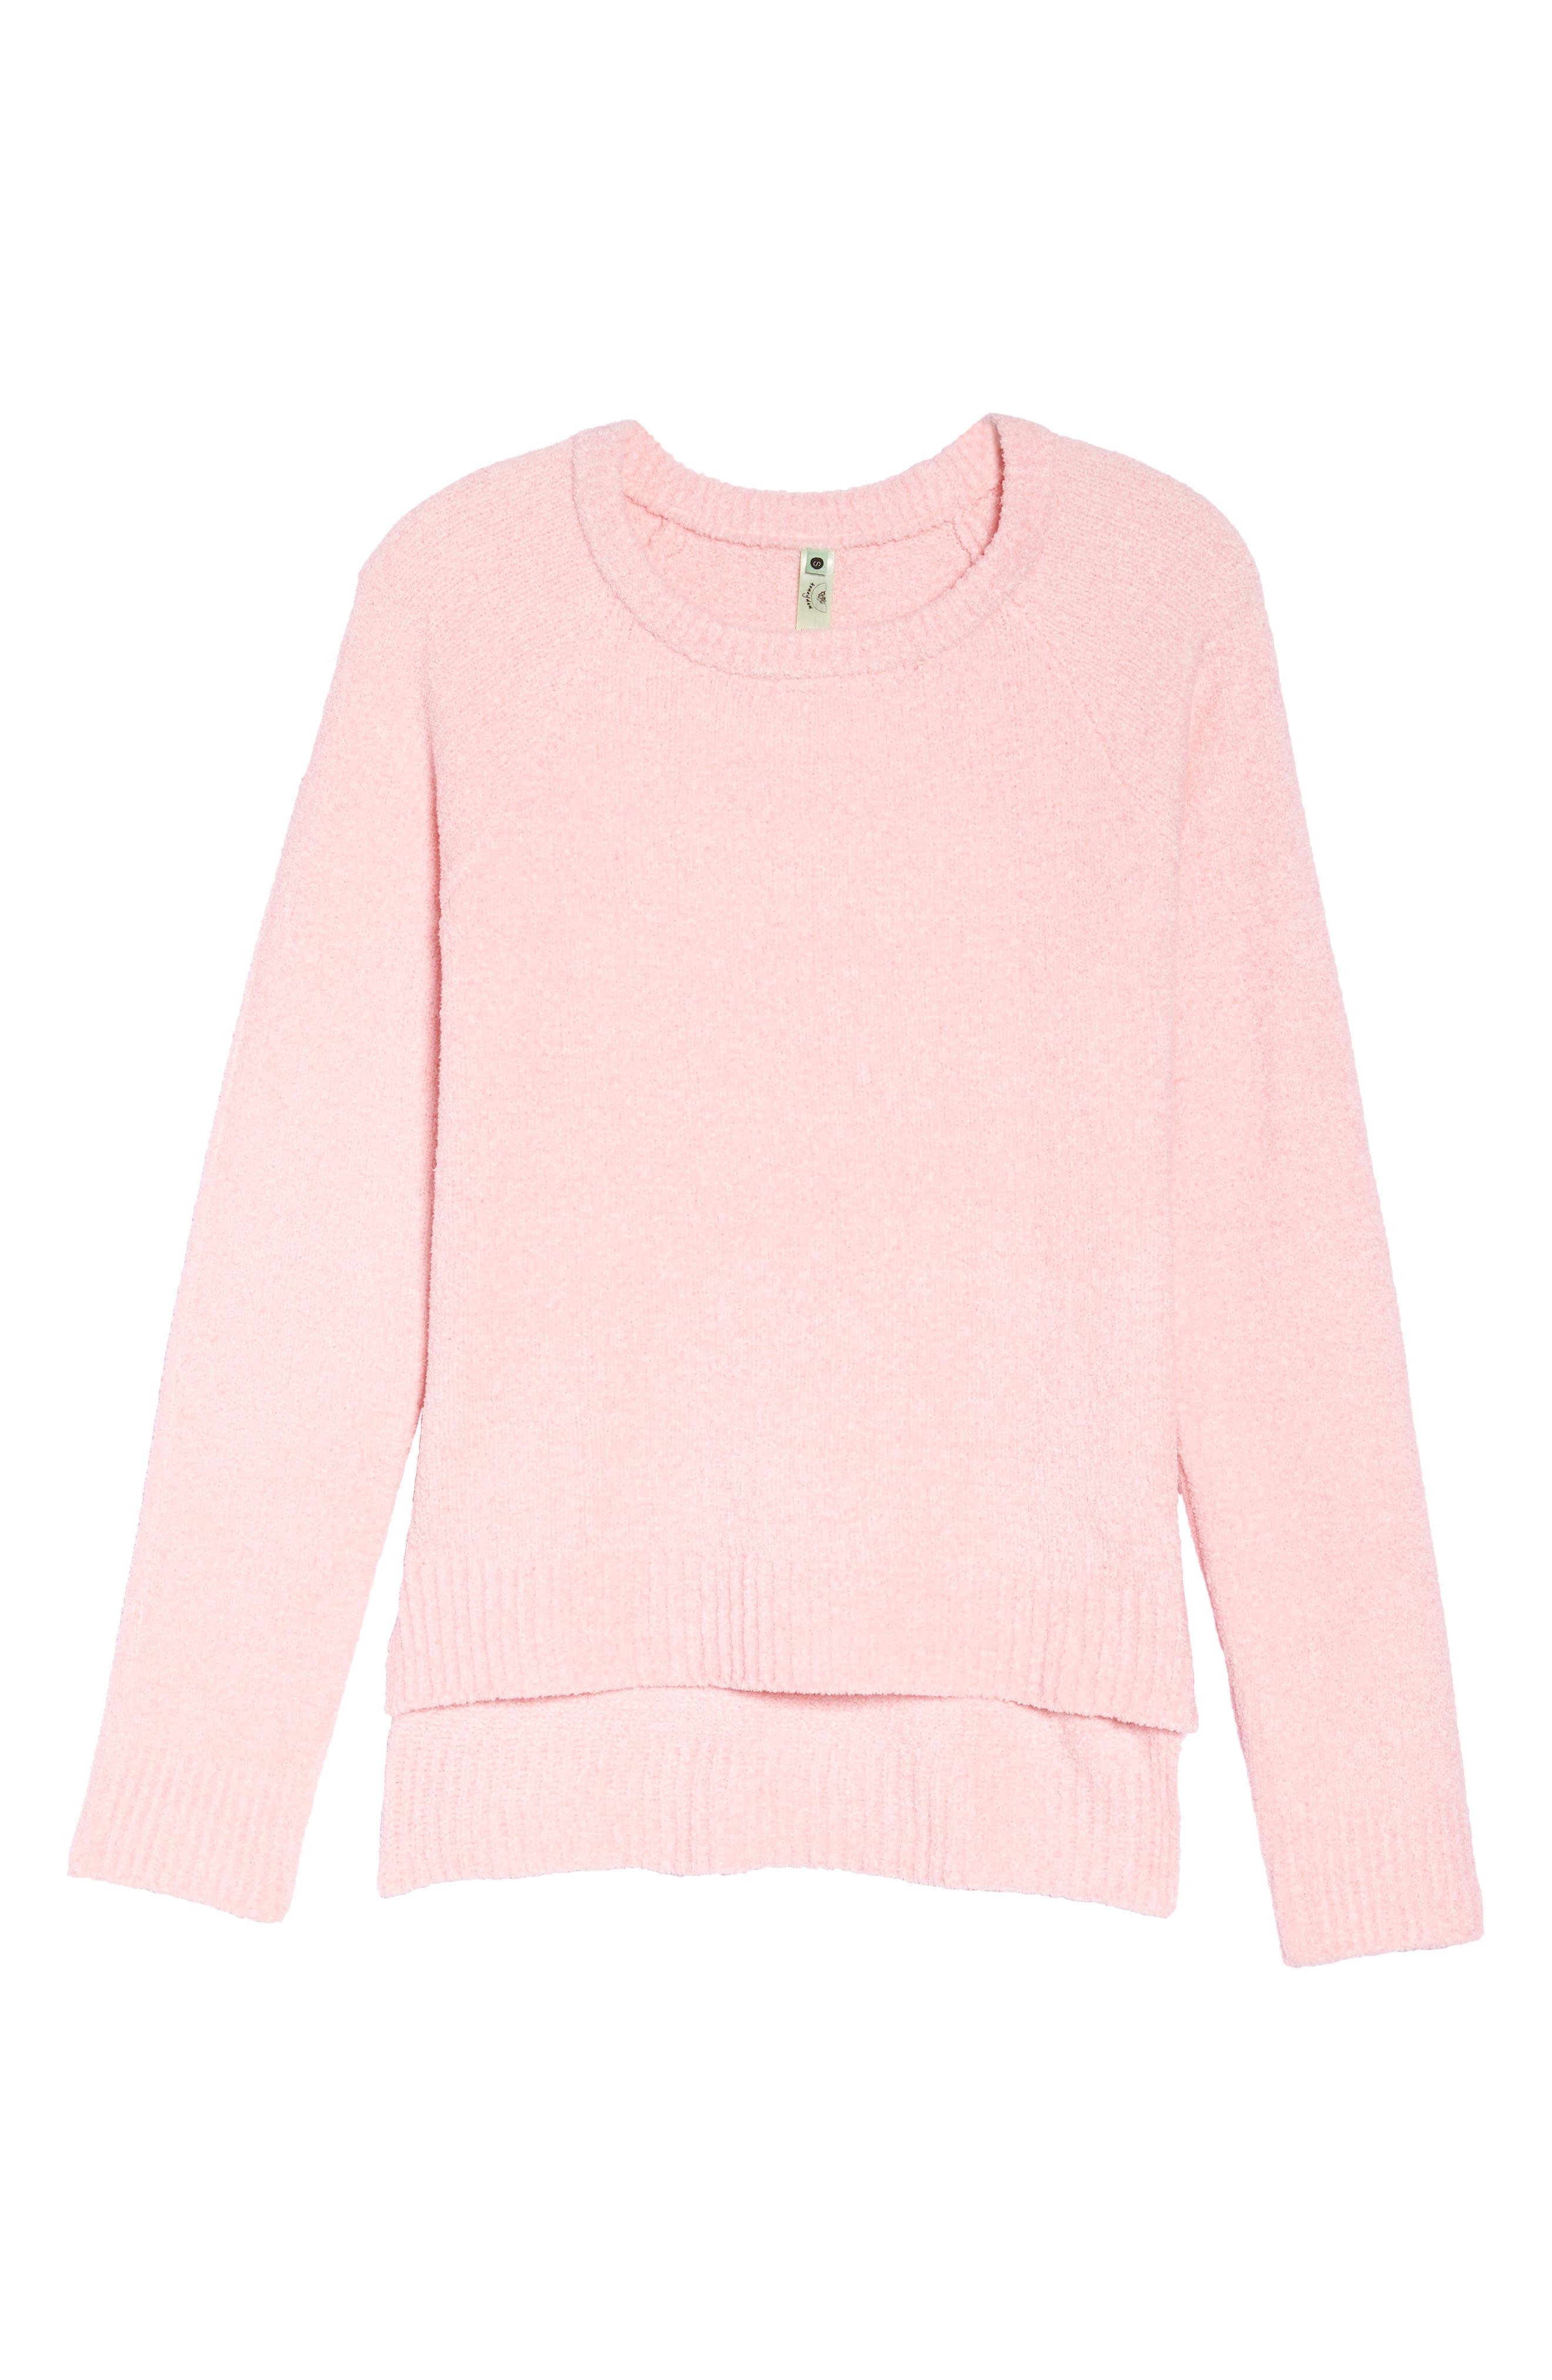 Marshmallow Sweatshirt,                             Alternate thumbnail 12, color,